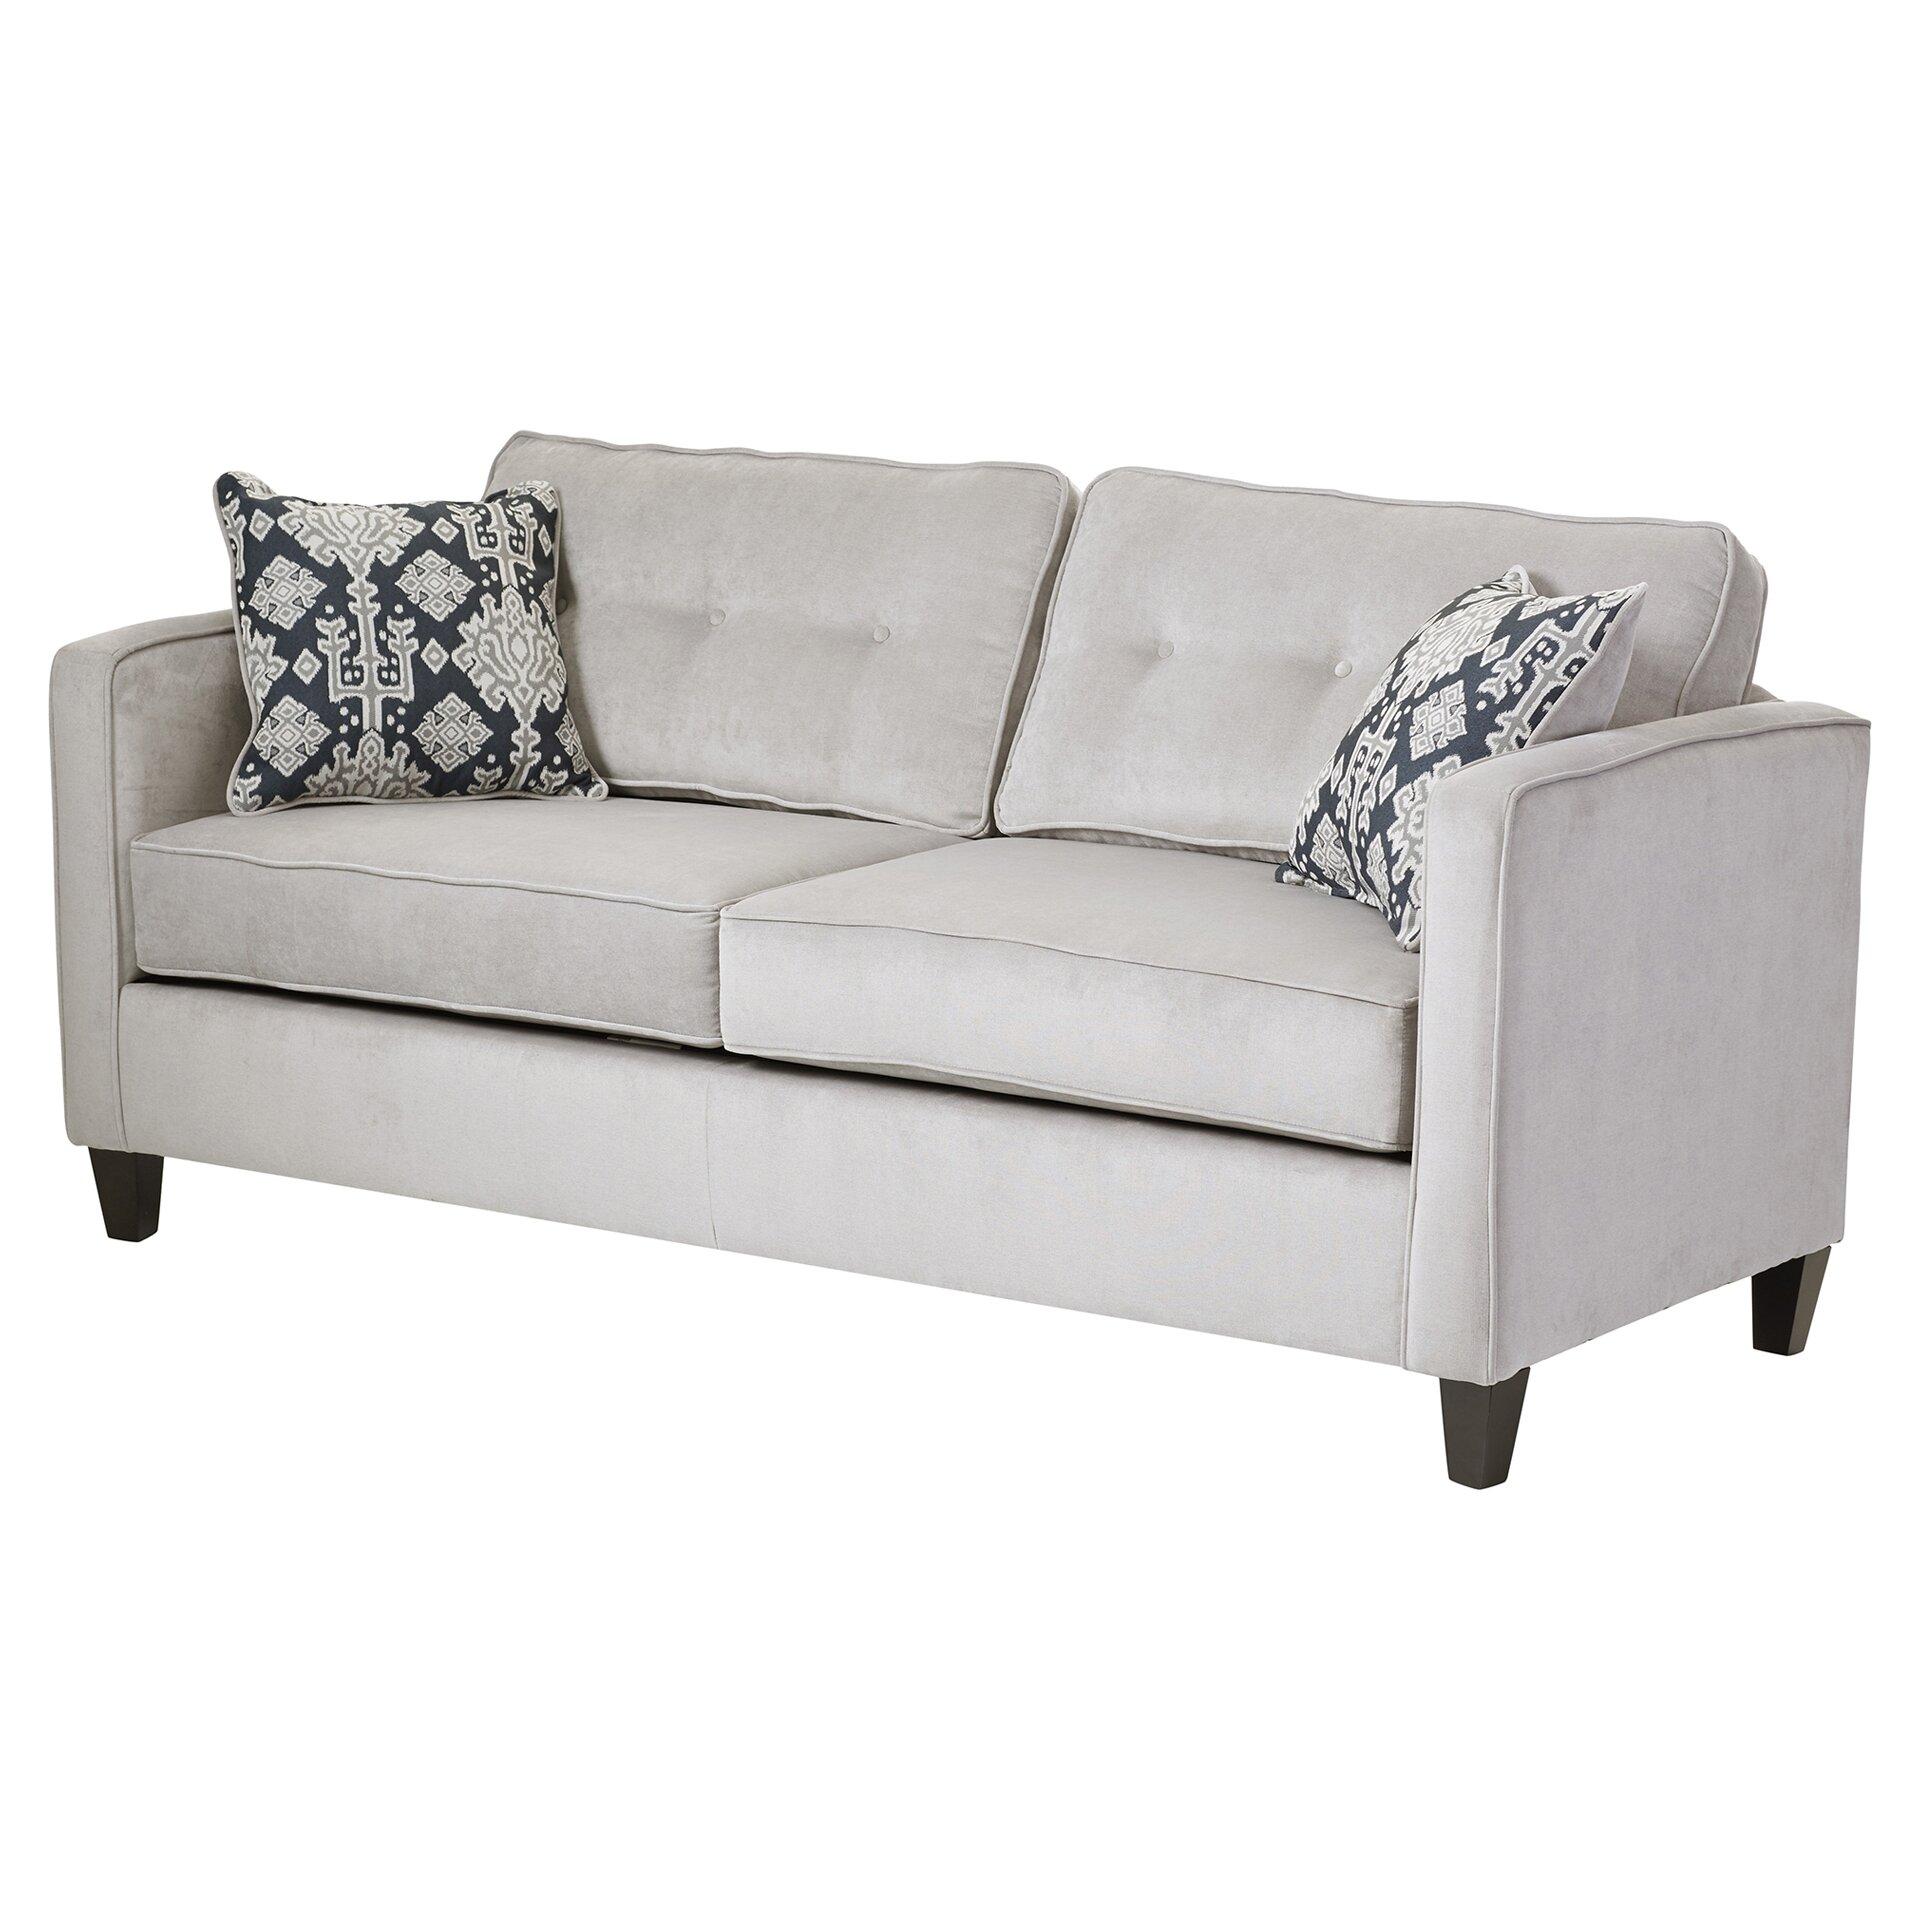 Serta Upholstery Cypress Sofa & Reviews